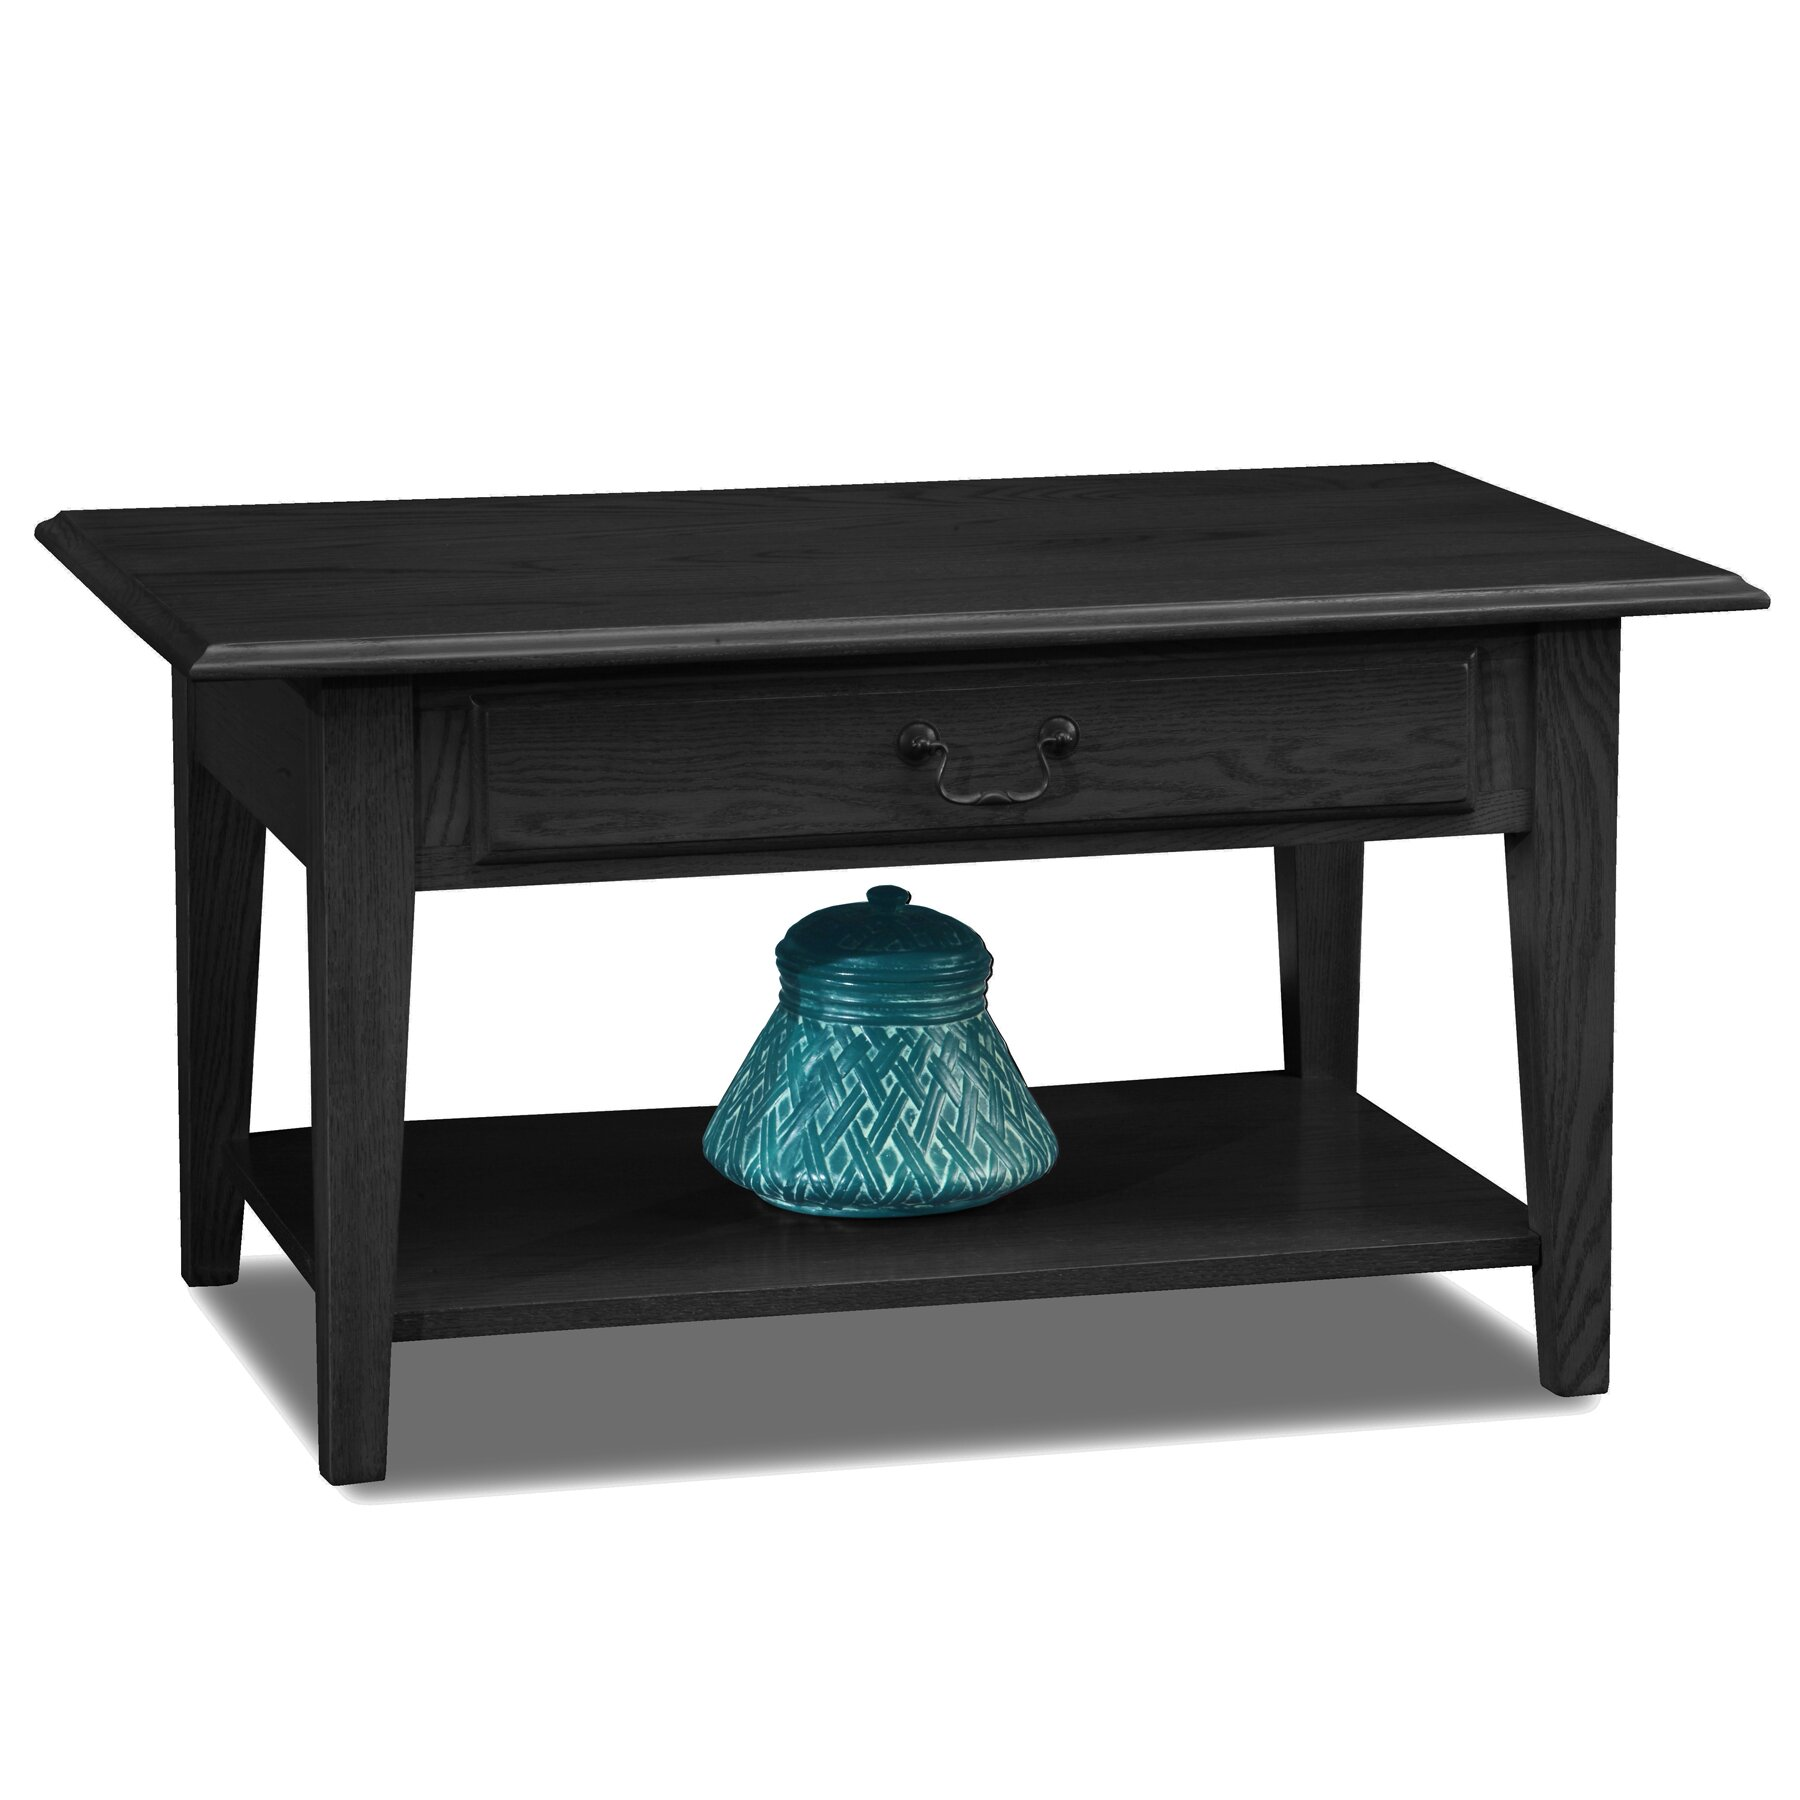 leick shaker coffee table reviews wayfair. Black Bedroom Furniture Sets. Home Design Ideas